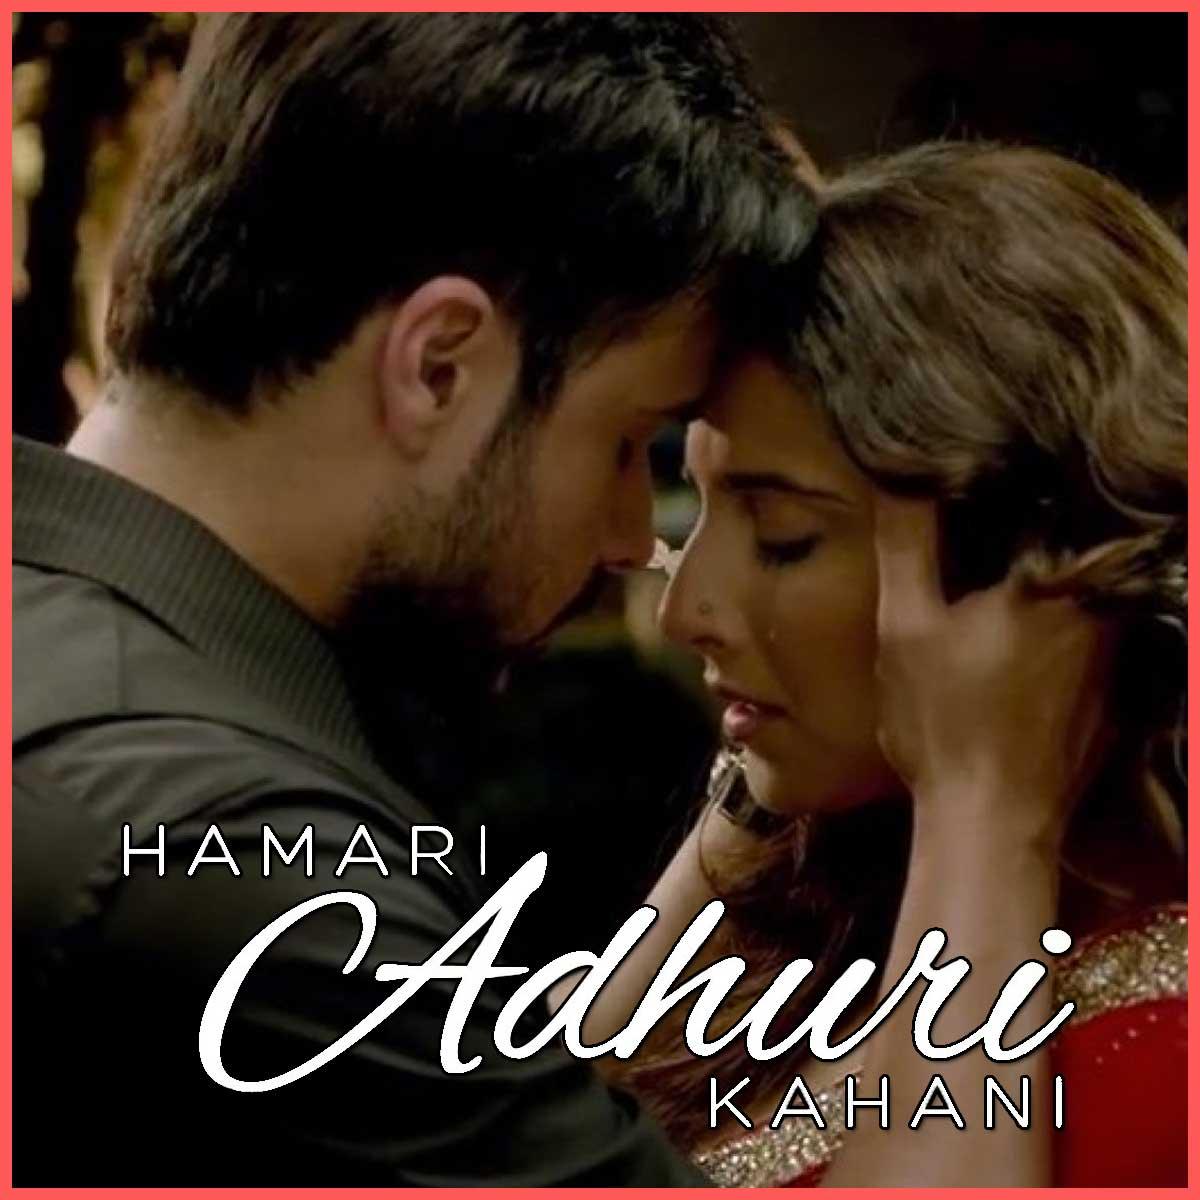 Hamari Adhuri Kahani 1 720p Download Free Movie